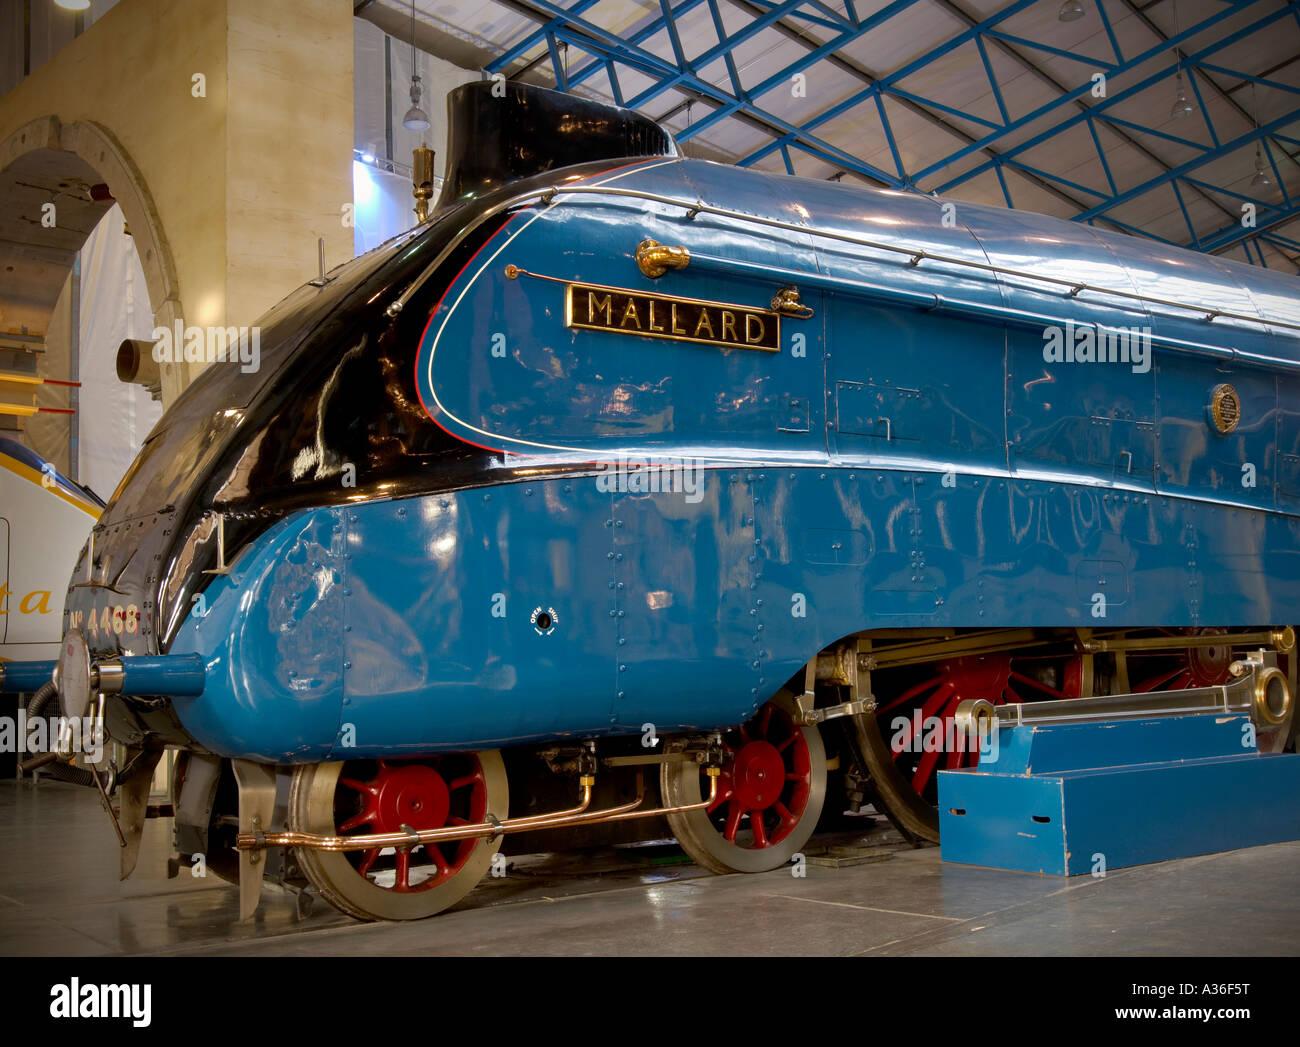 Horizontal photo of Mallard steam train at National Railway Museum York UK Holder of speed record in 1930s - Stock Image